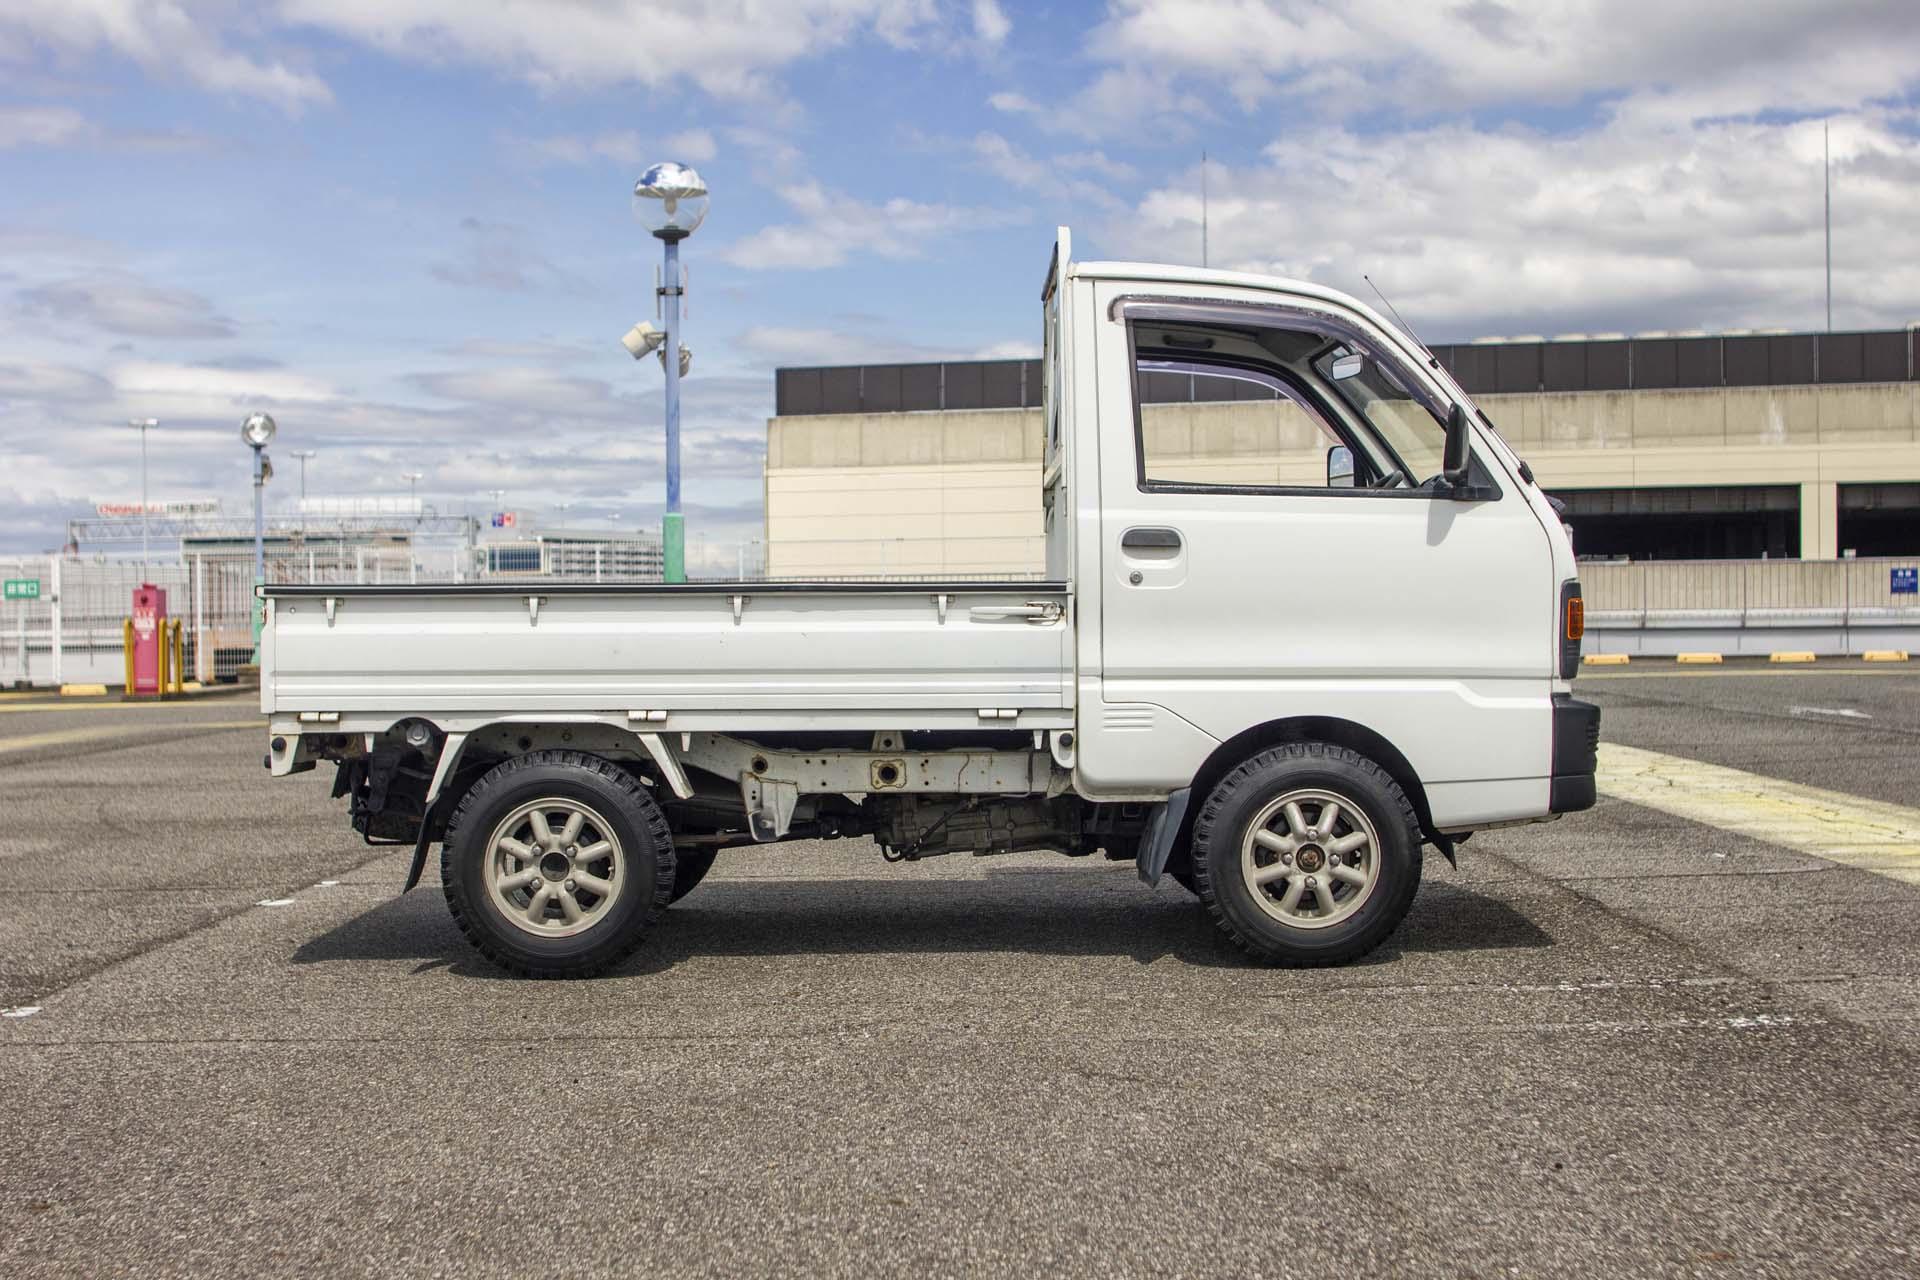 1991 MISTSUBISHI MINICAB TRUCK 4WD